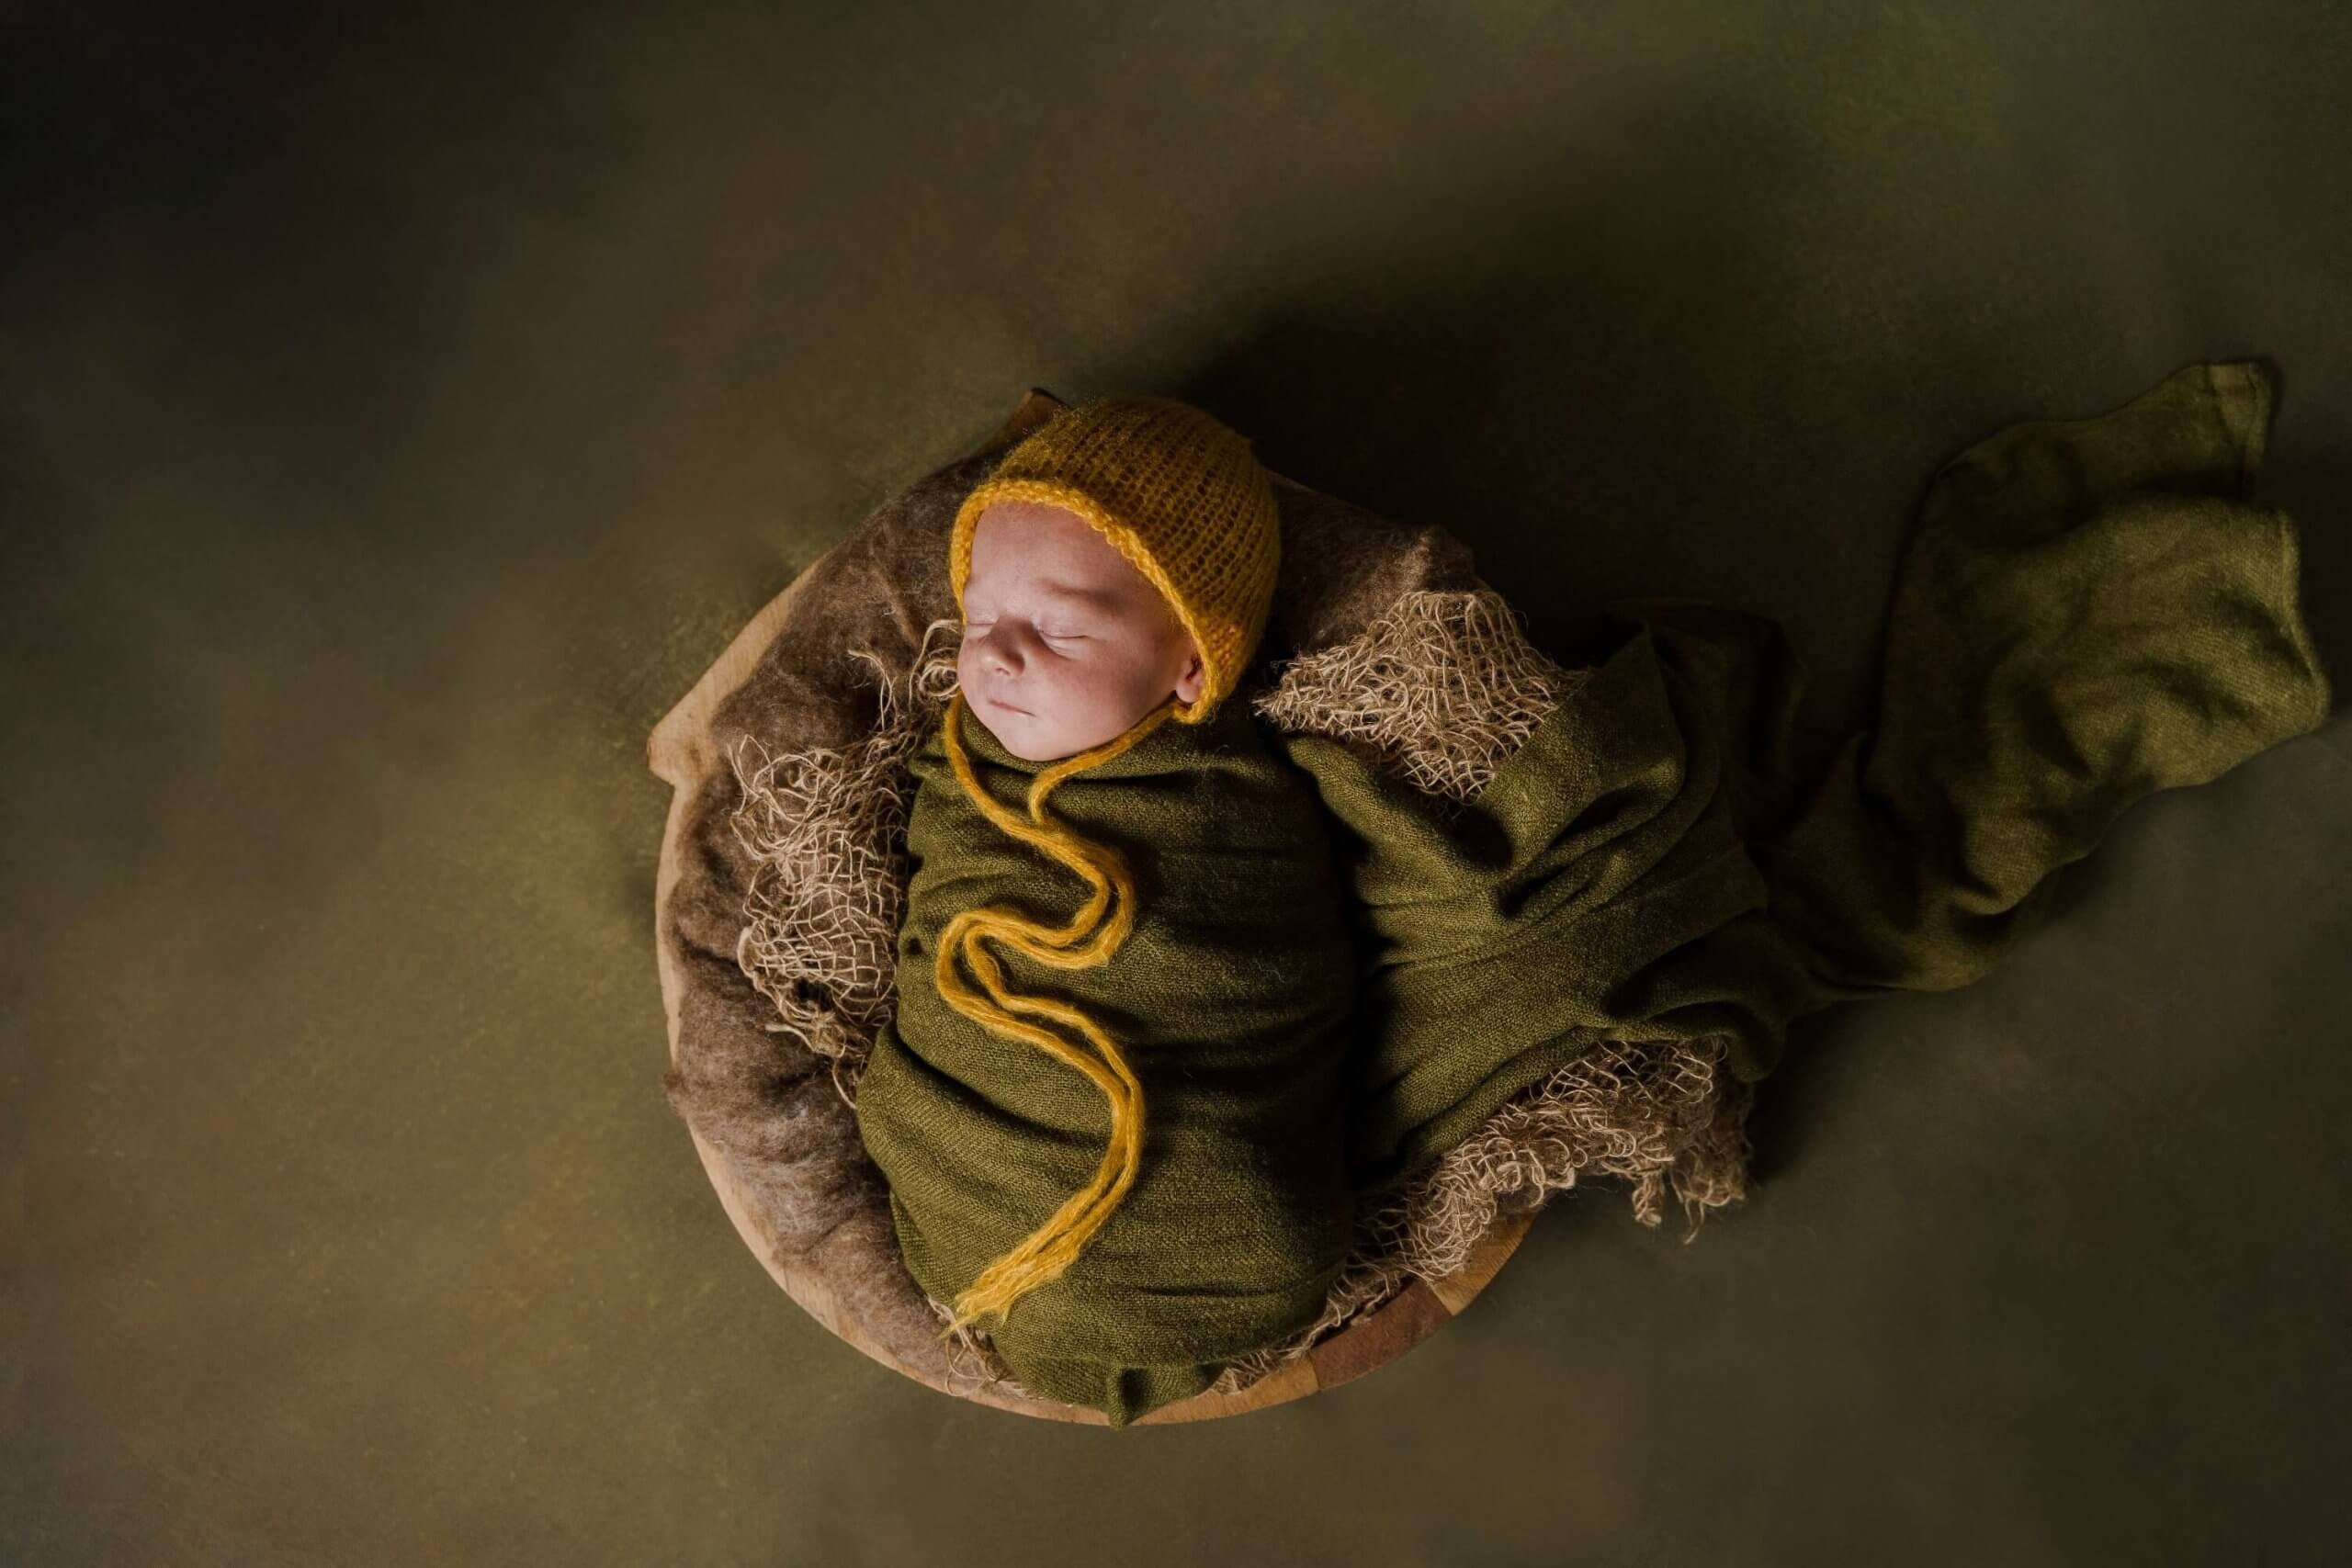 Newborn thuis portret groen fotoachtergrond